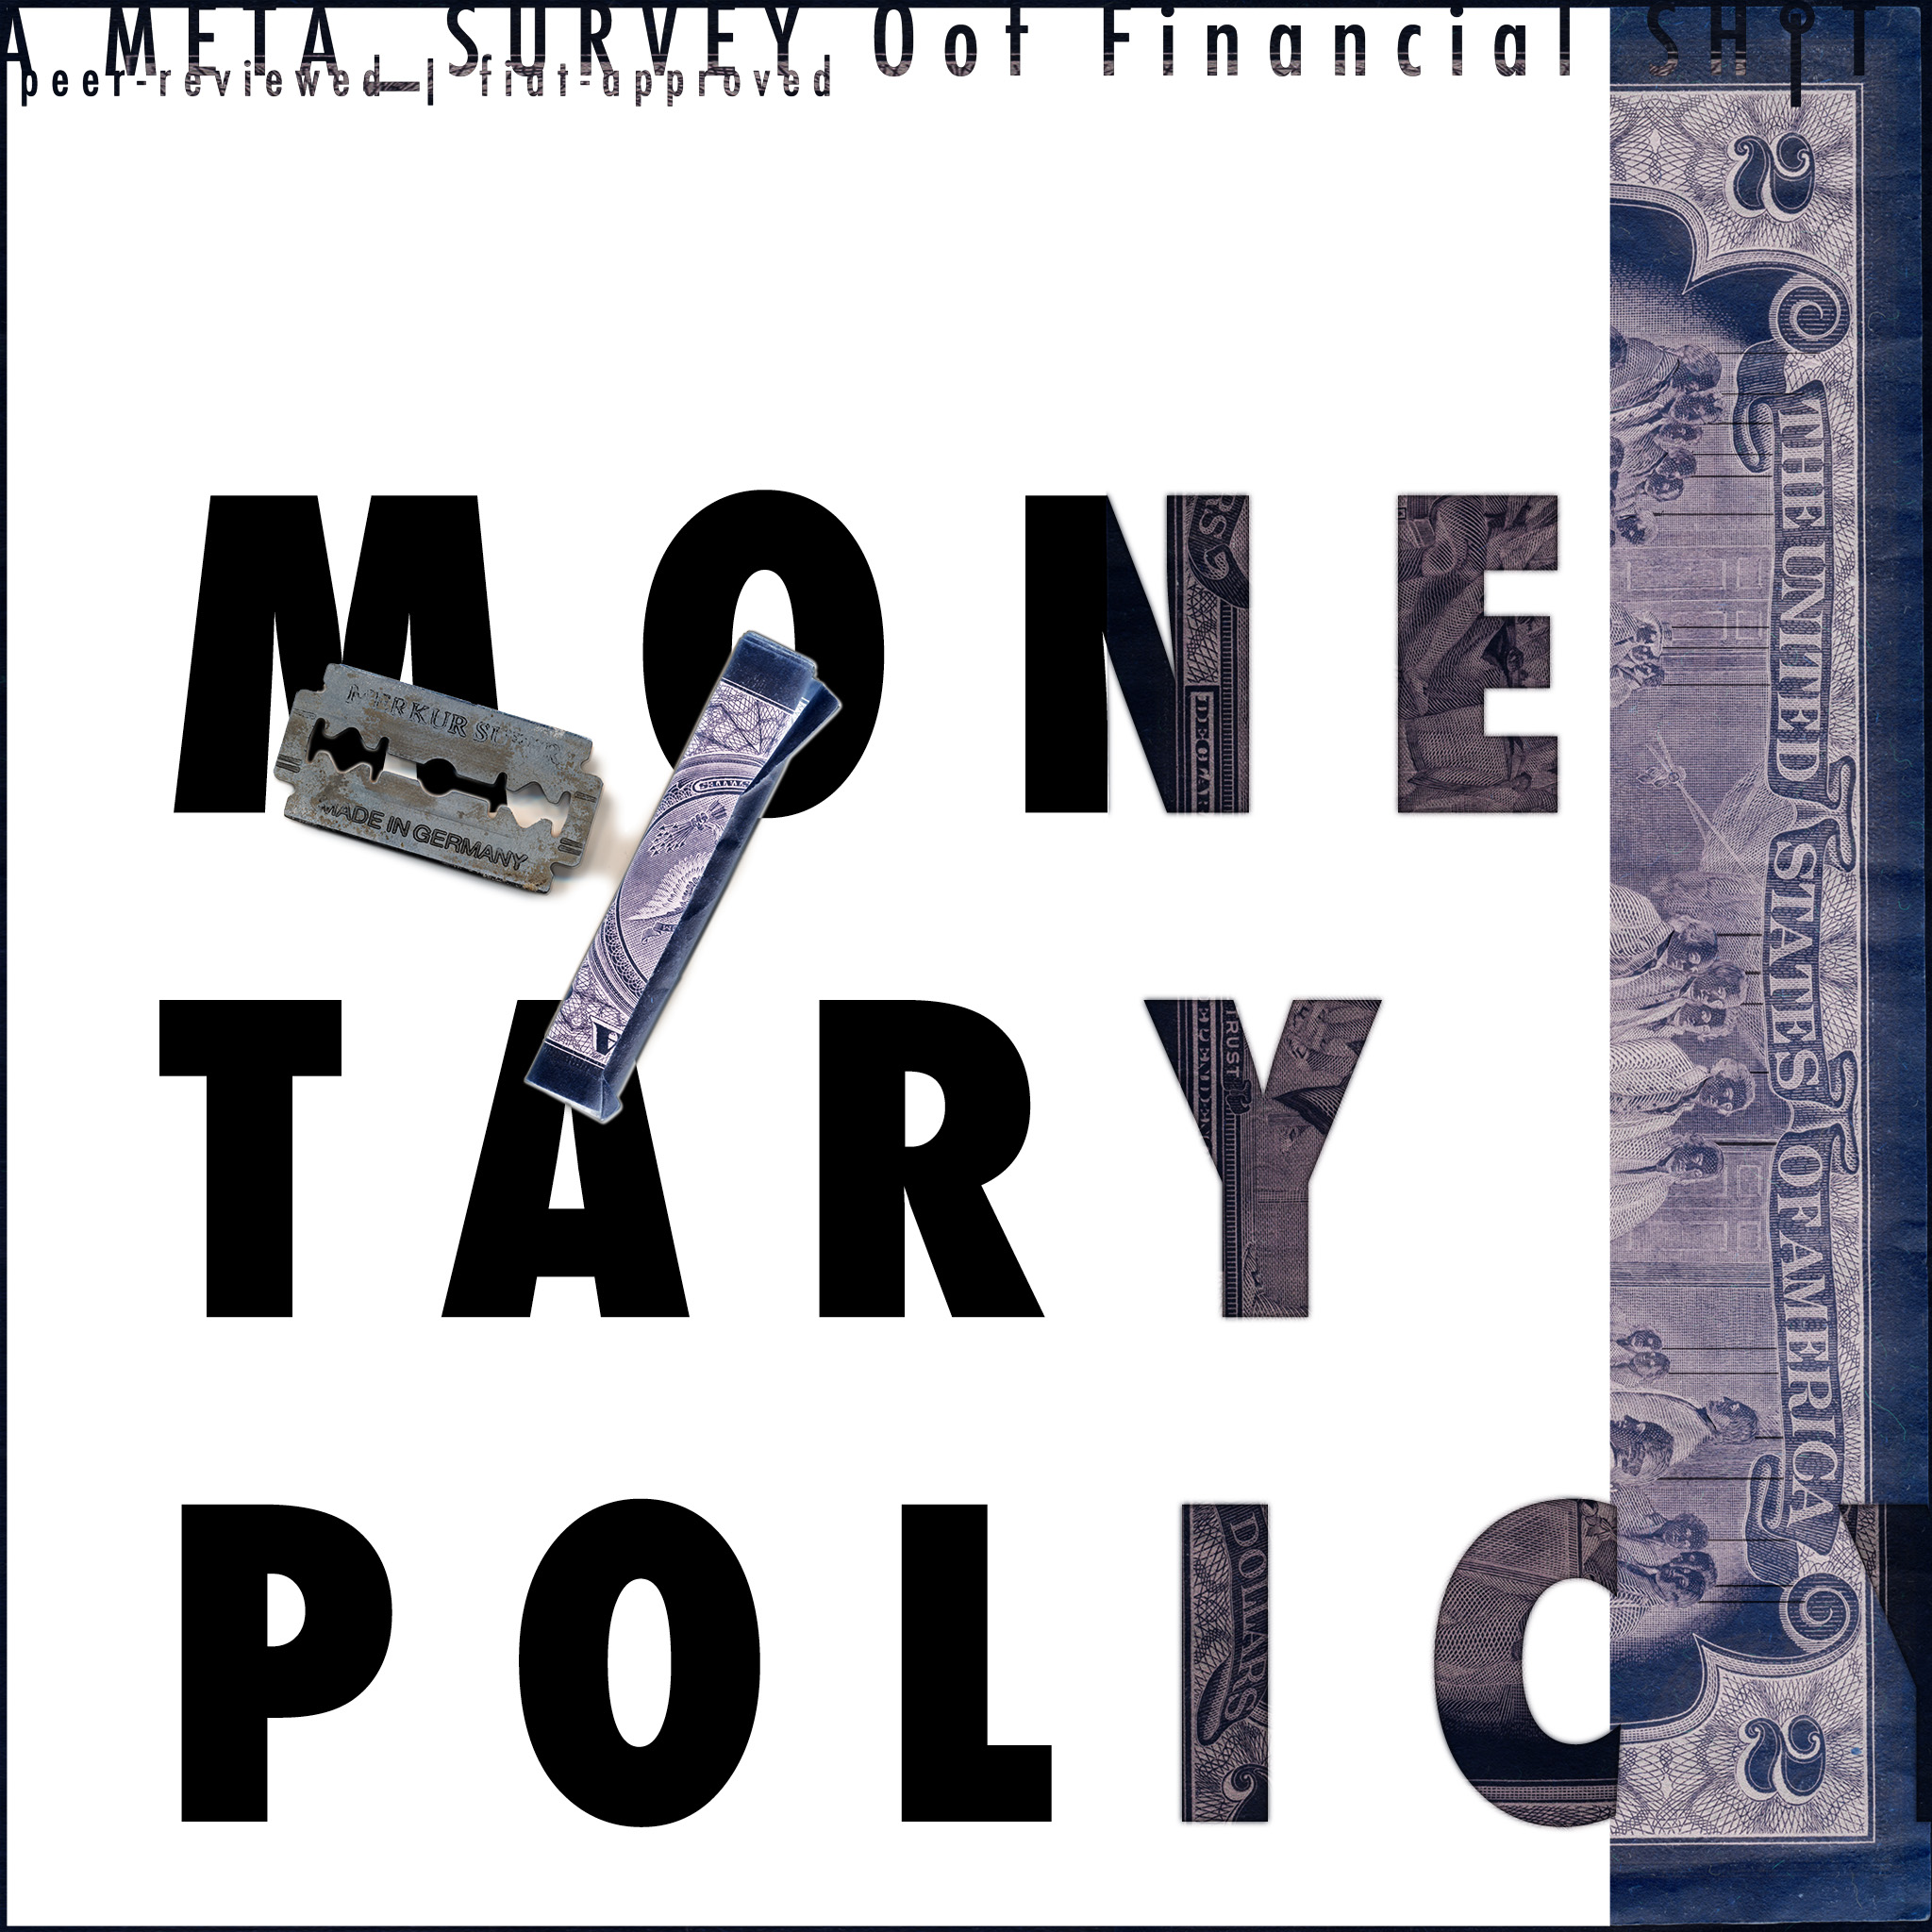 18 SATURDAY NIGHT SPECIAL INSTANT BONSAI MONITARY POLICY Book Cover SQ.jpg